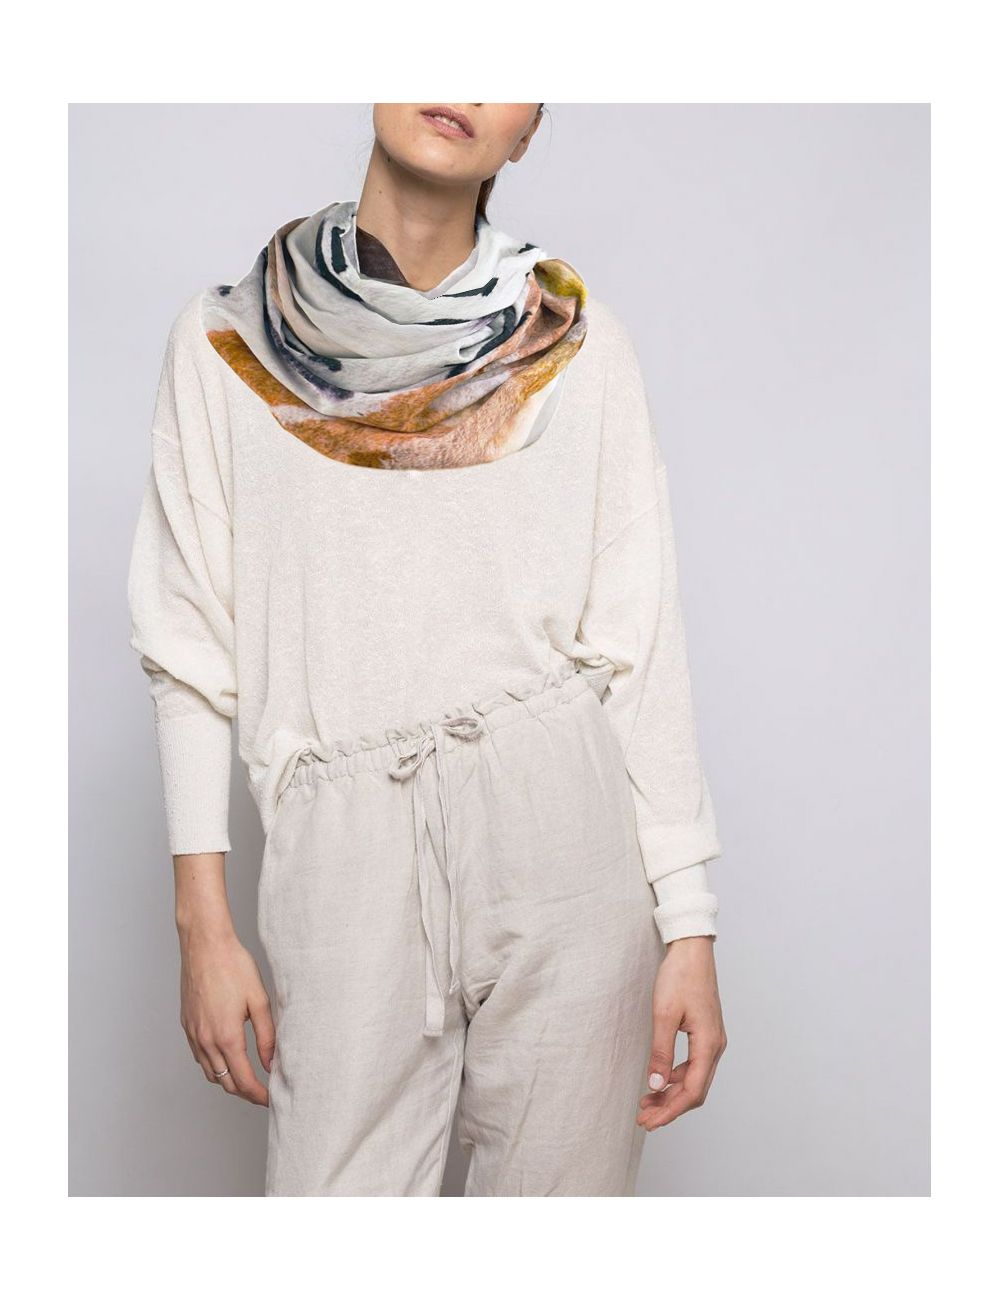 Fulard Crepe